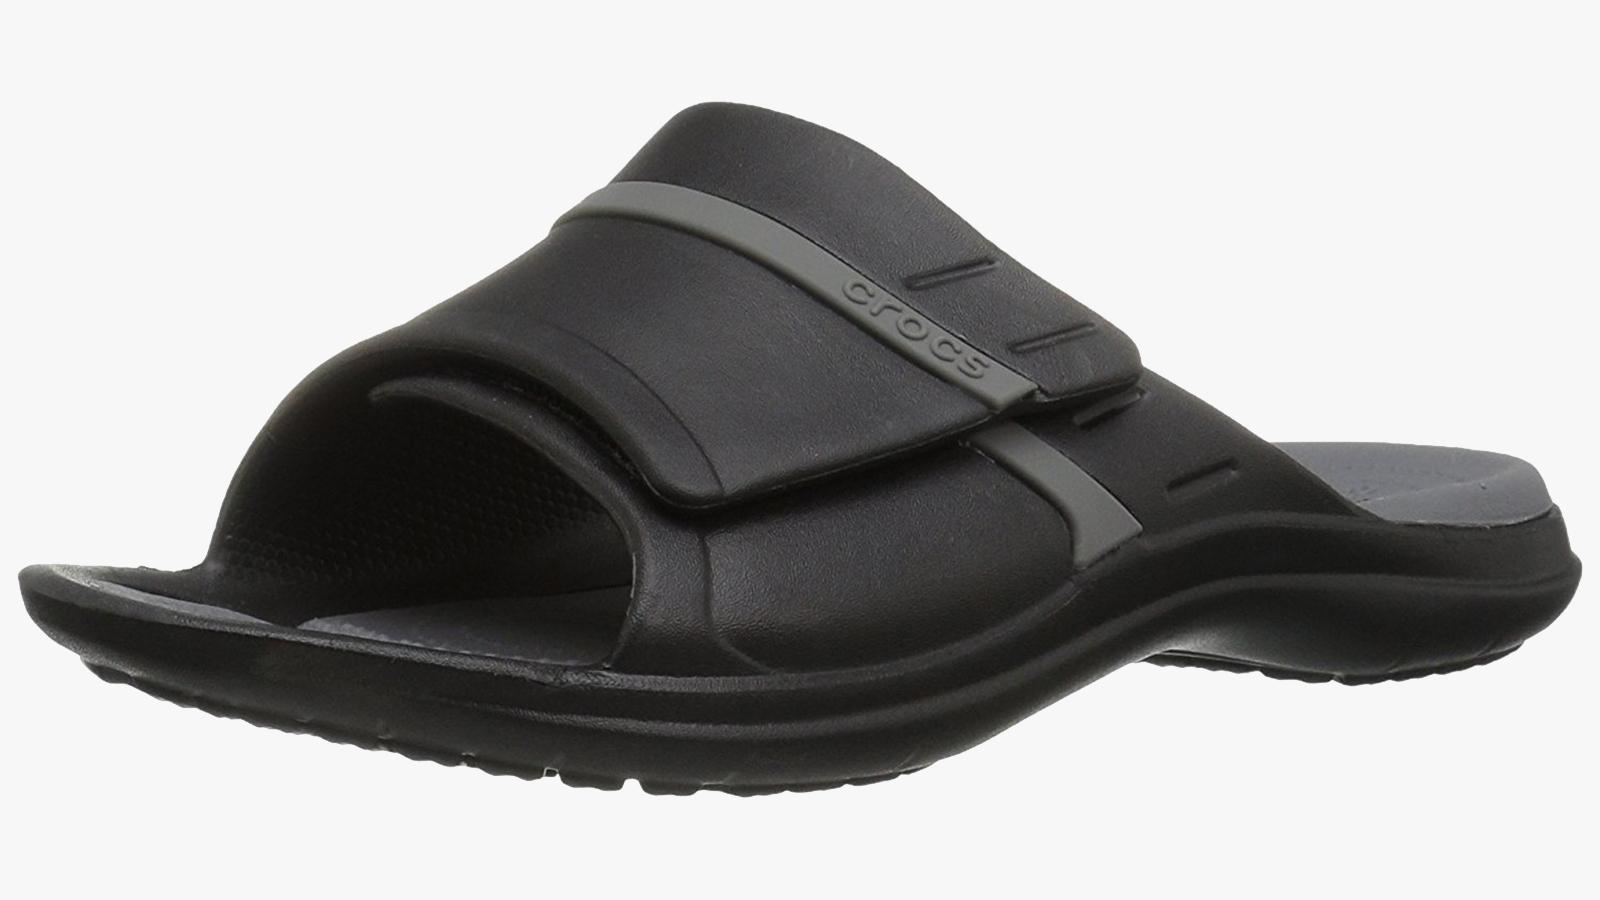 Crocs Modi Sports Best Men's Slides